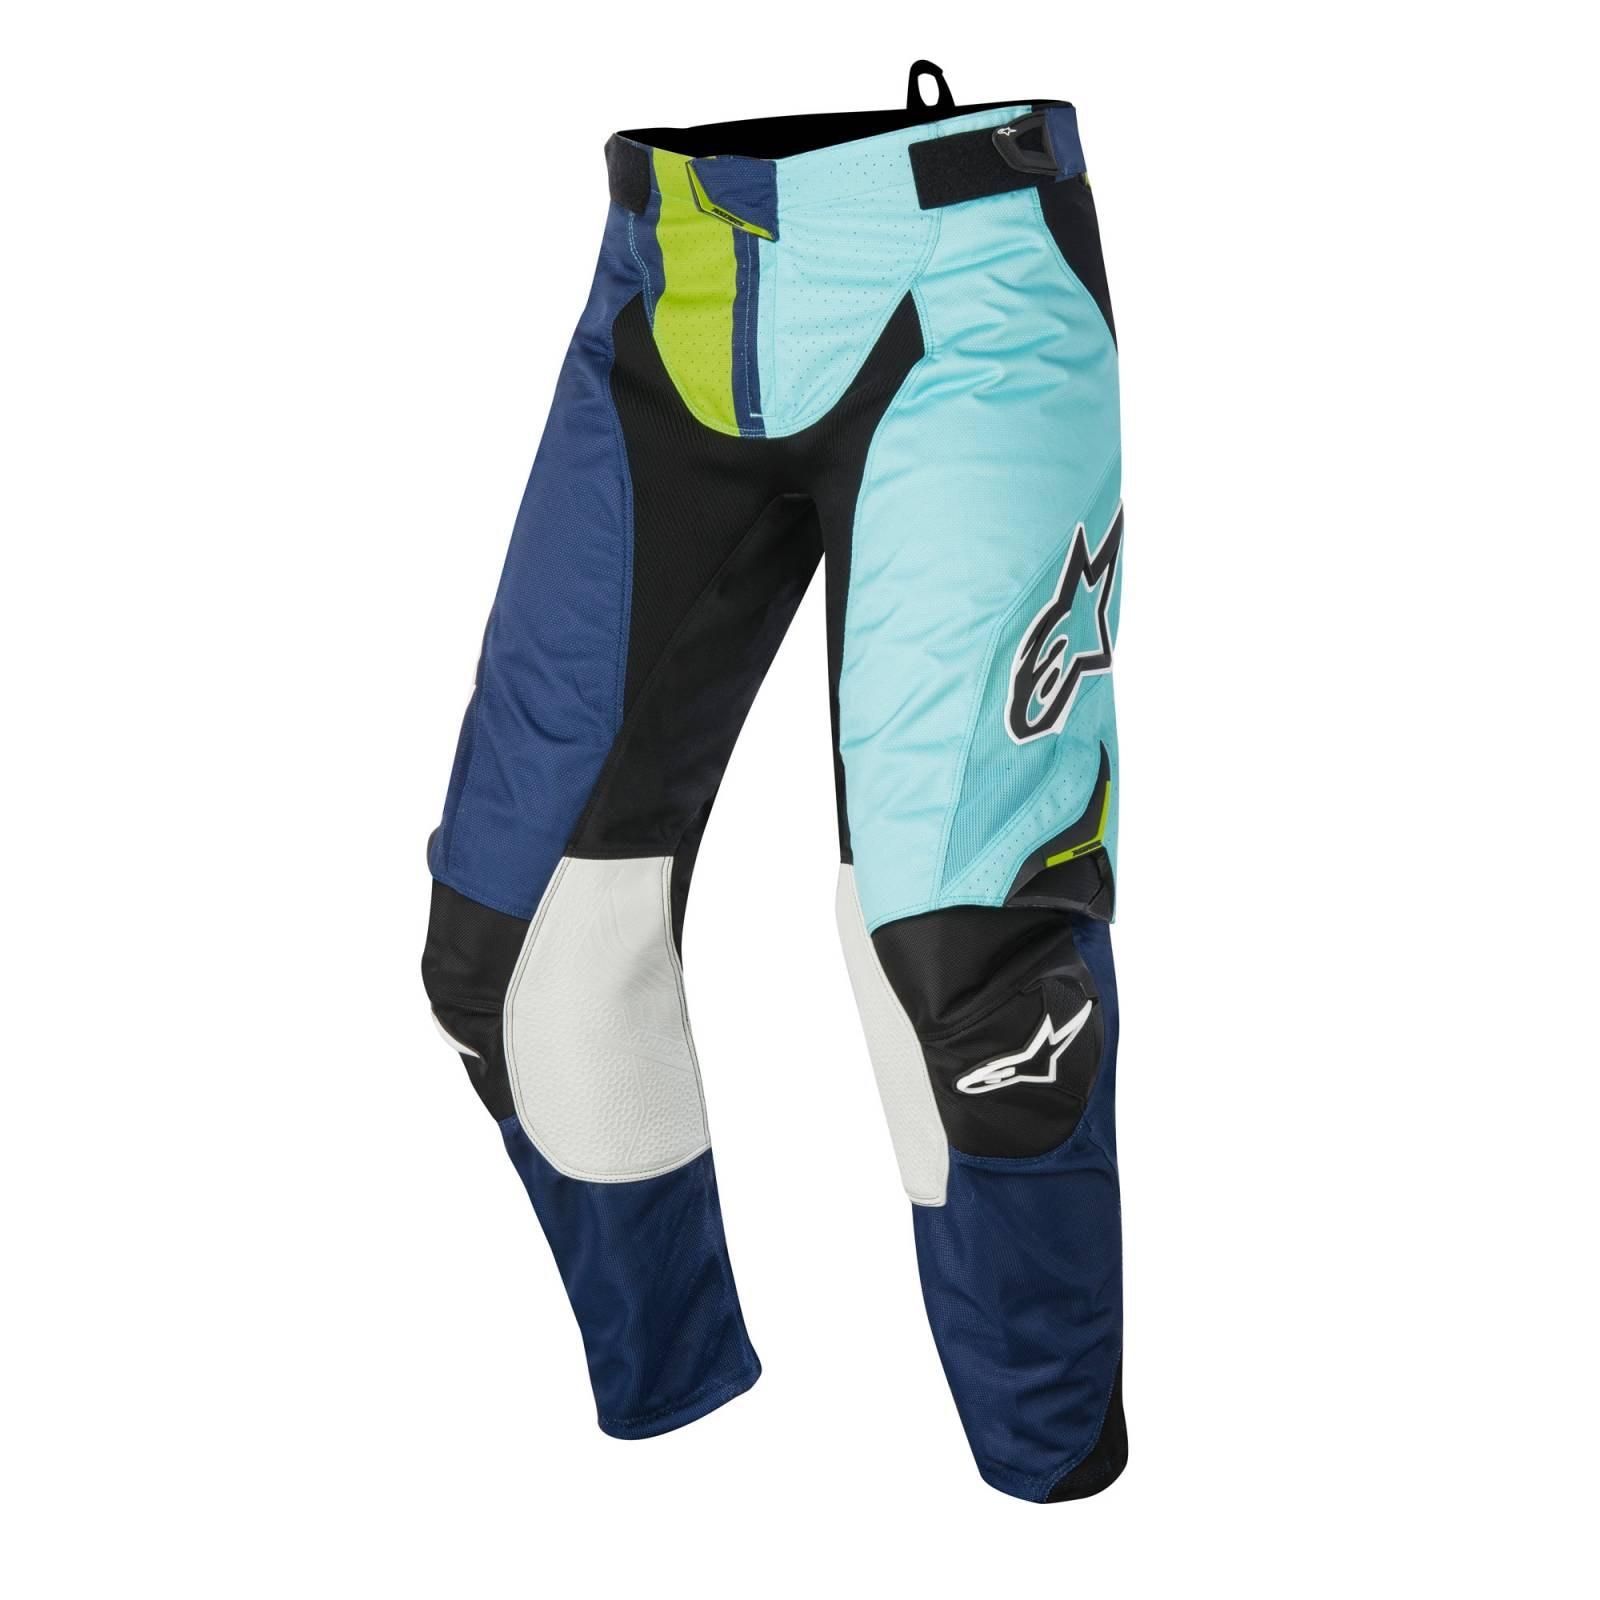 Alpinestars Pantalon Para Motocross Techstar Factory Marino Turquesa Lima